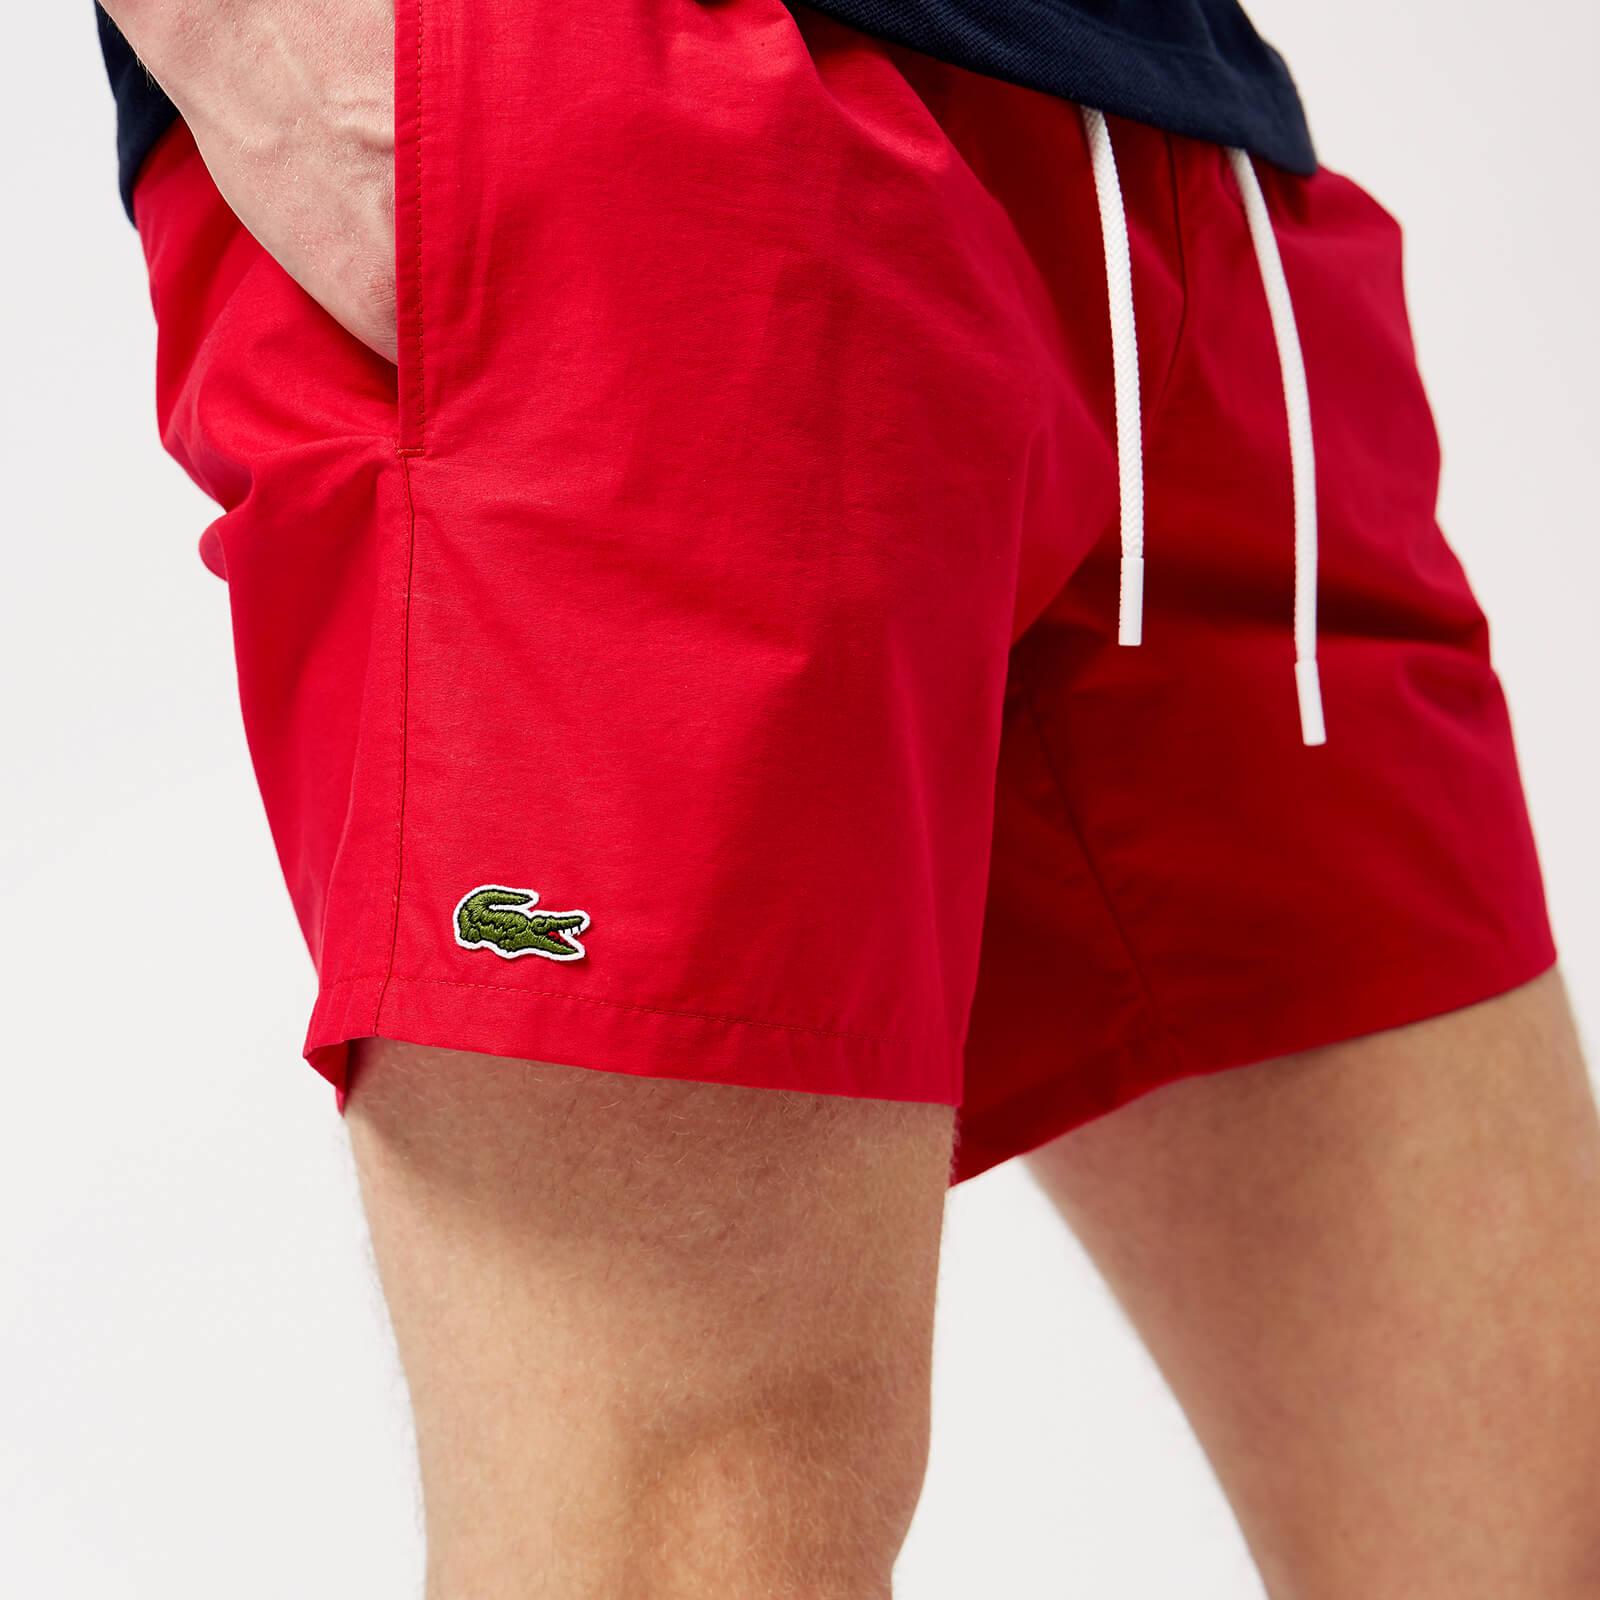 49453f54 Lacoste Men's Basic Swim Shorts - Toreador